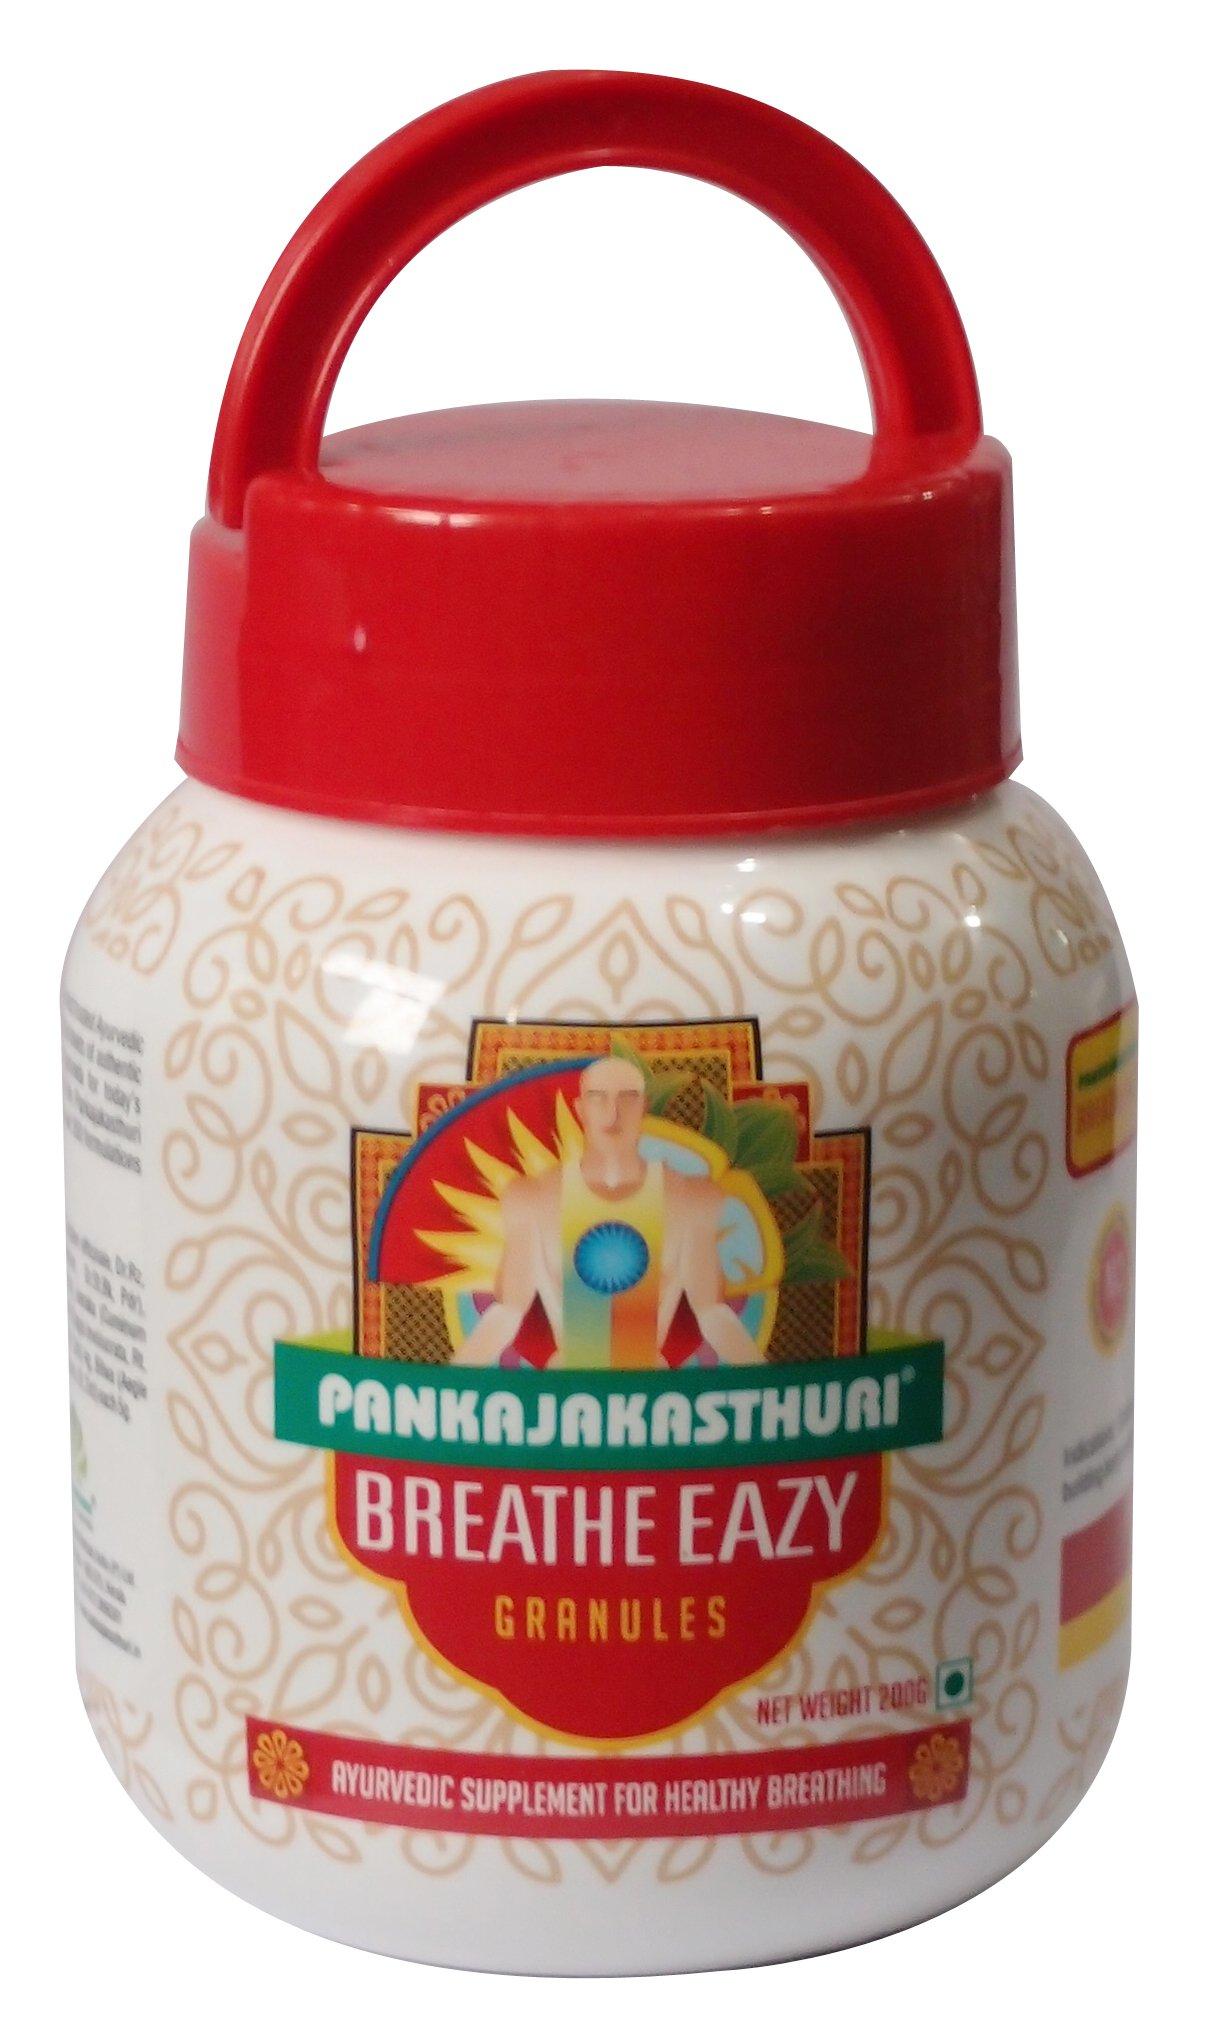 Amazon Pankaja Kasthuri Breathe Eazy 2 Packs 200g Each